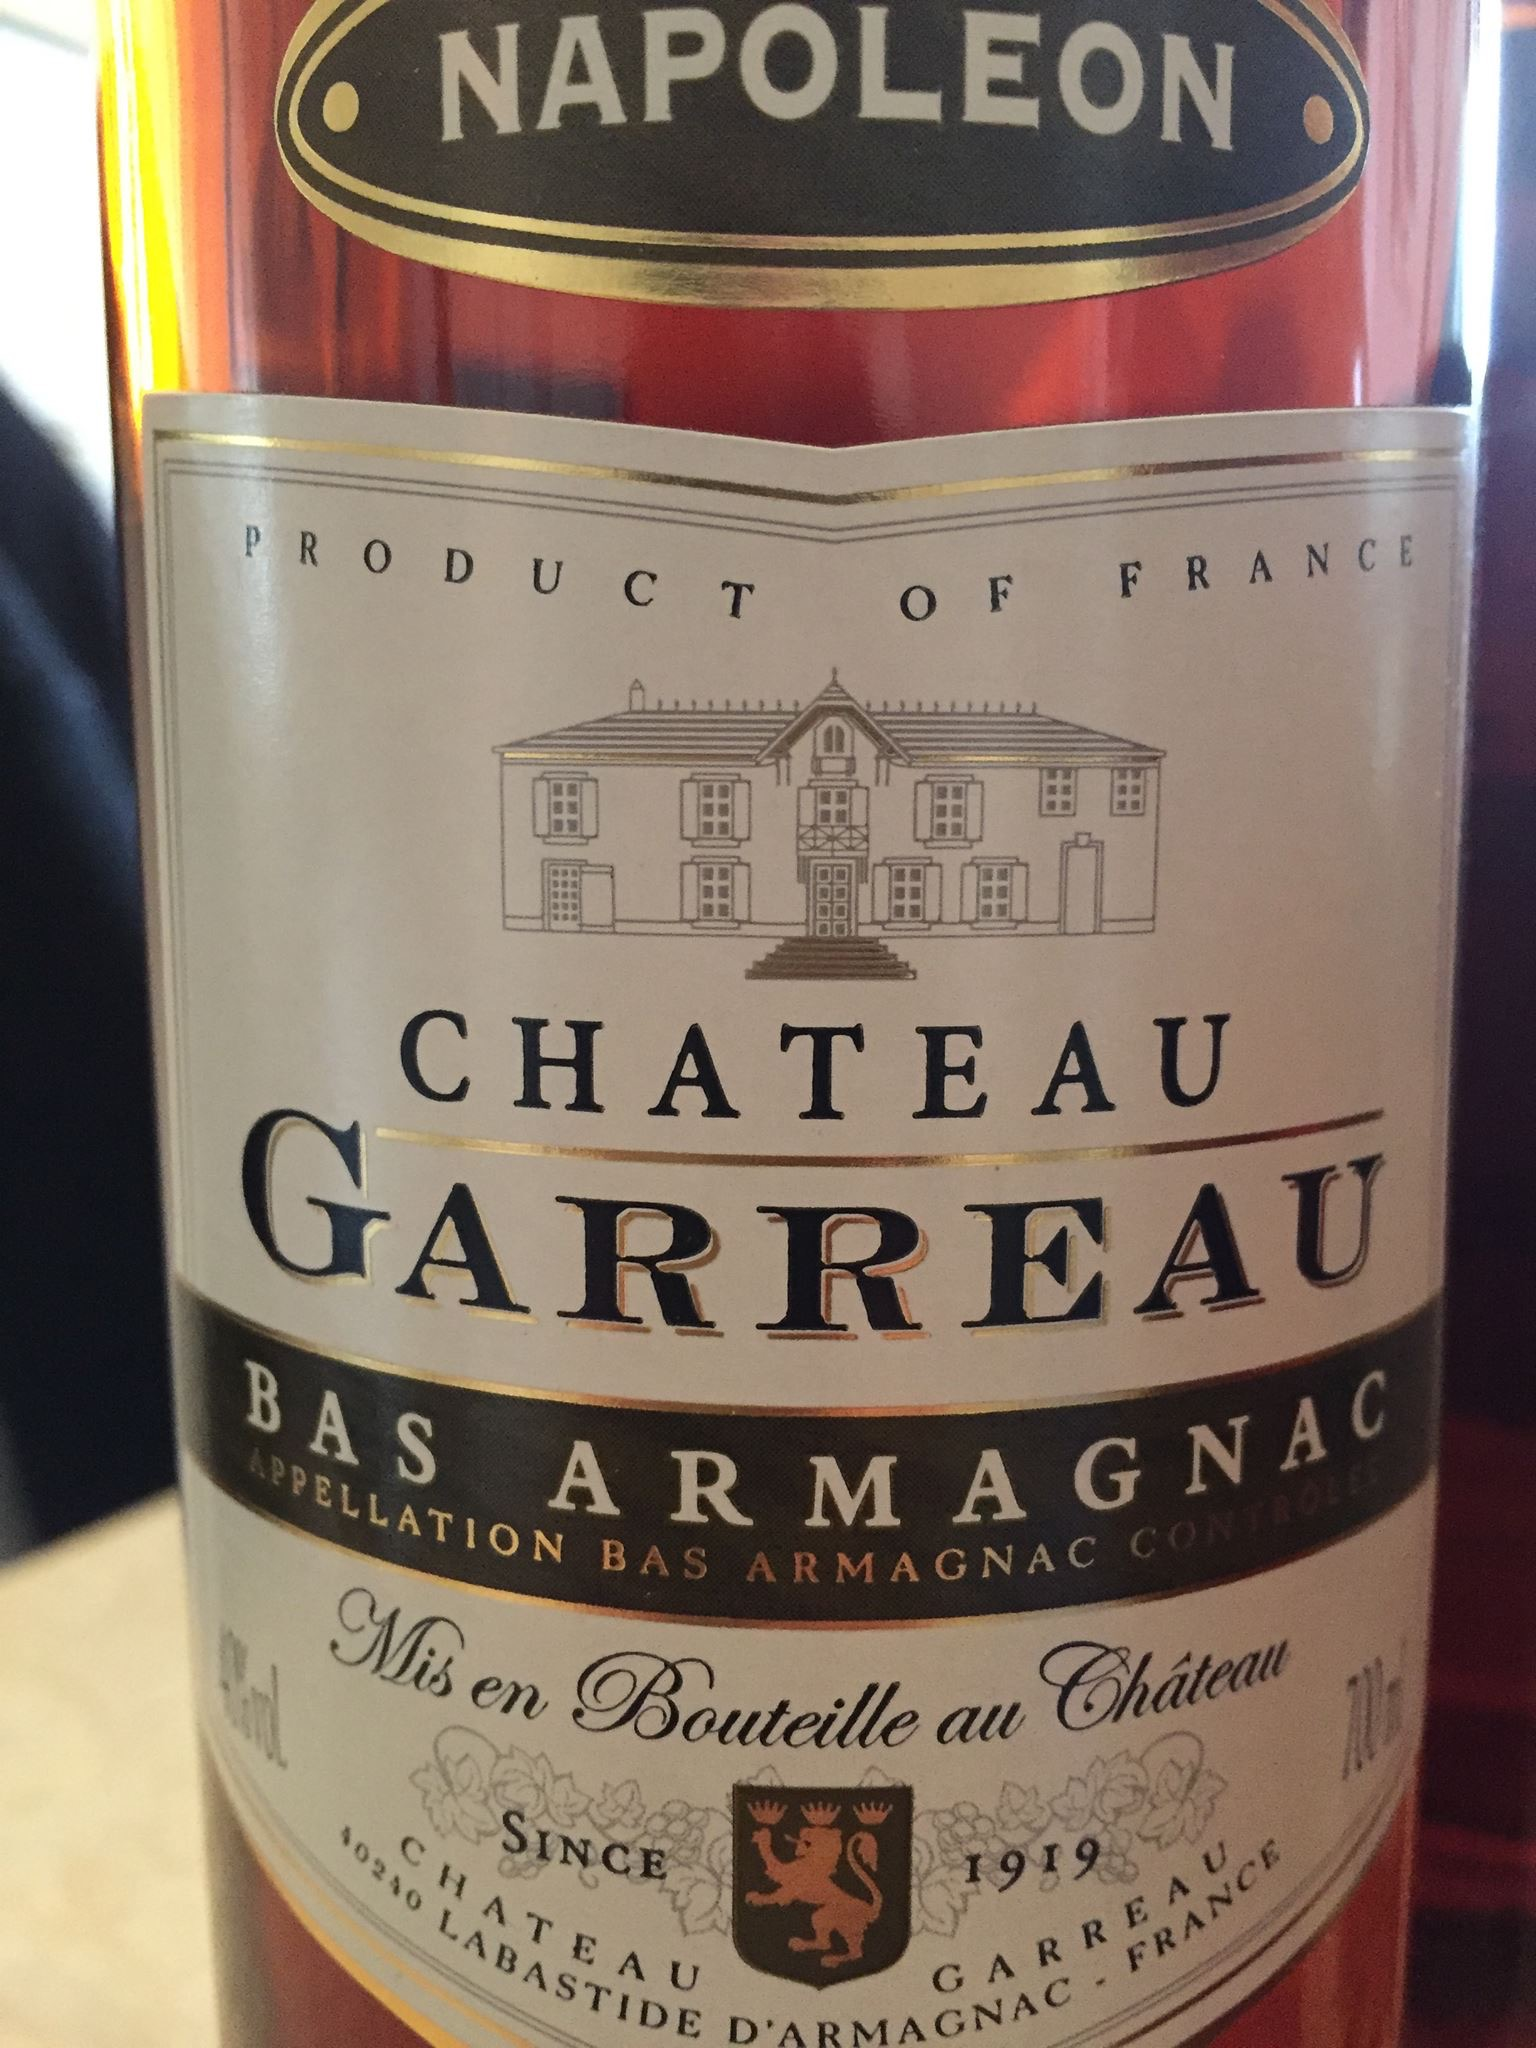 Château Garreau – Napoléon – Bas-Armagnac